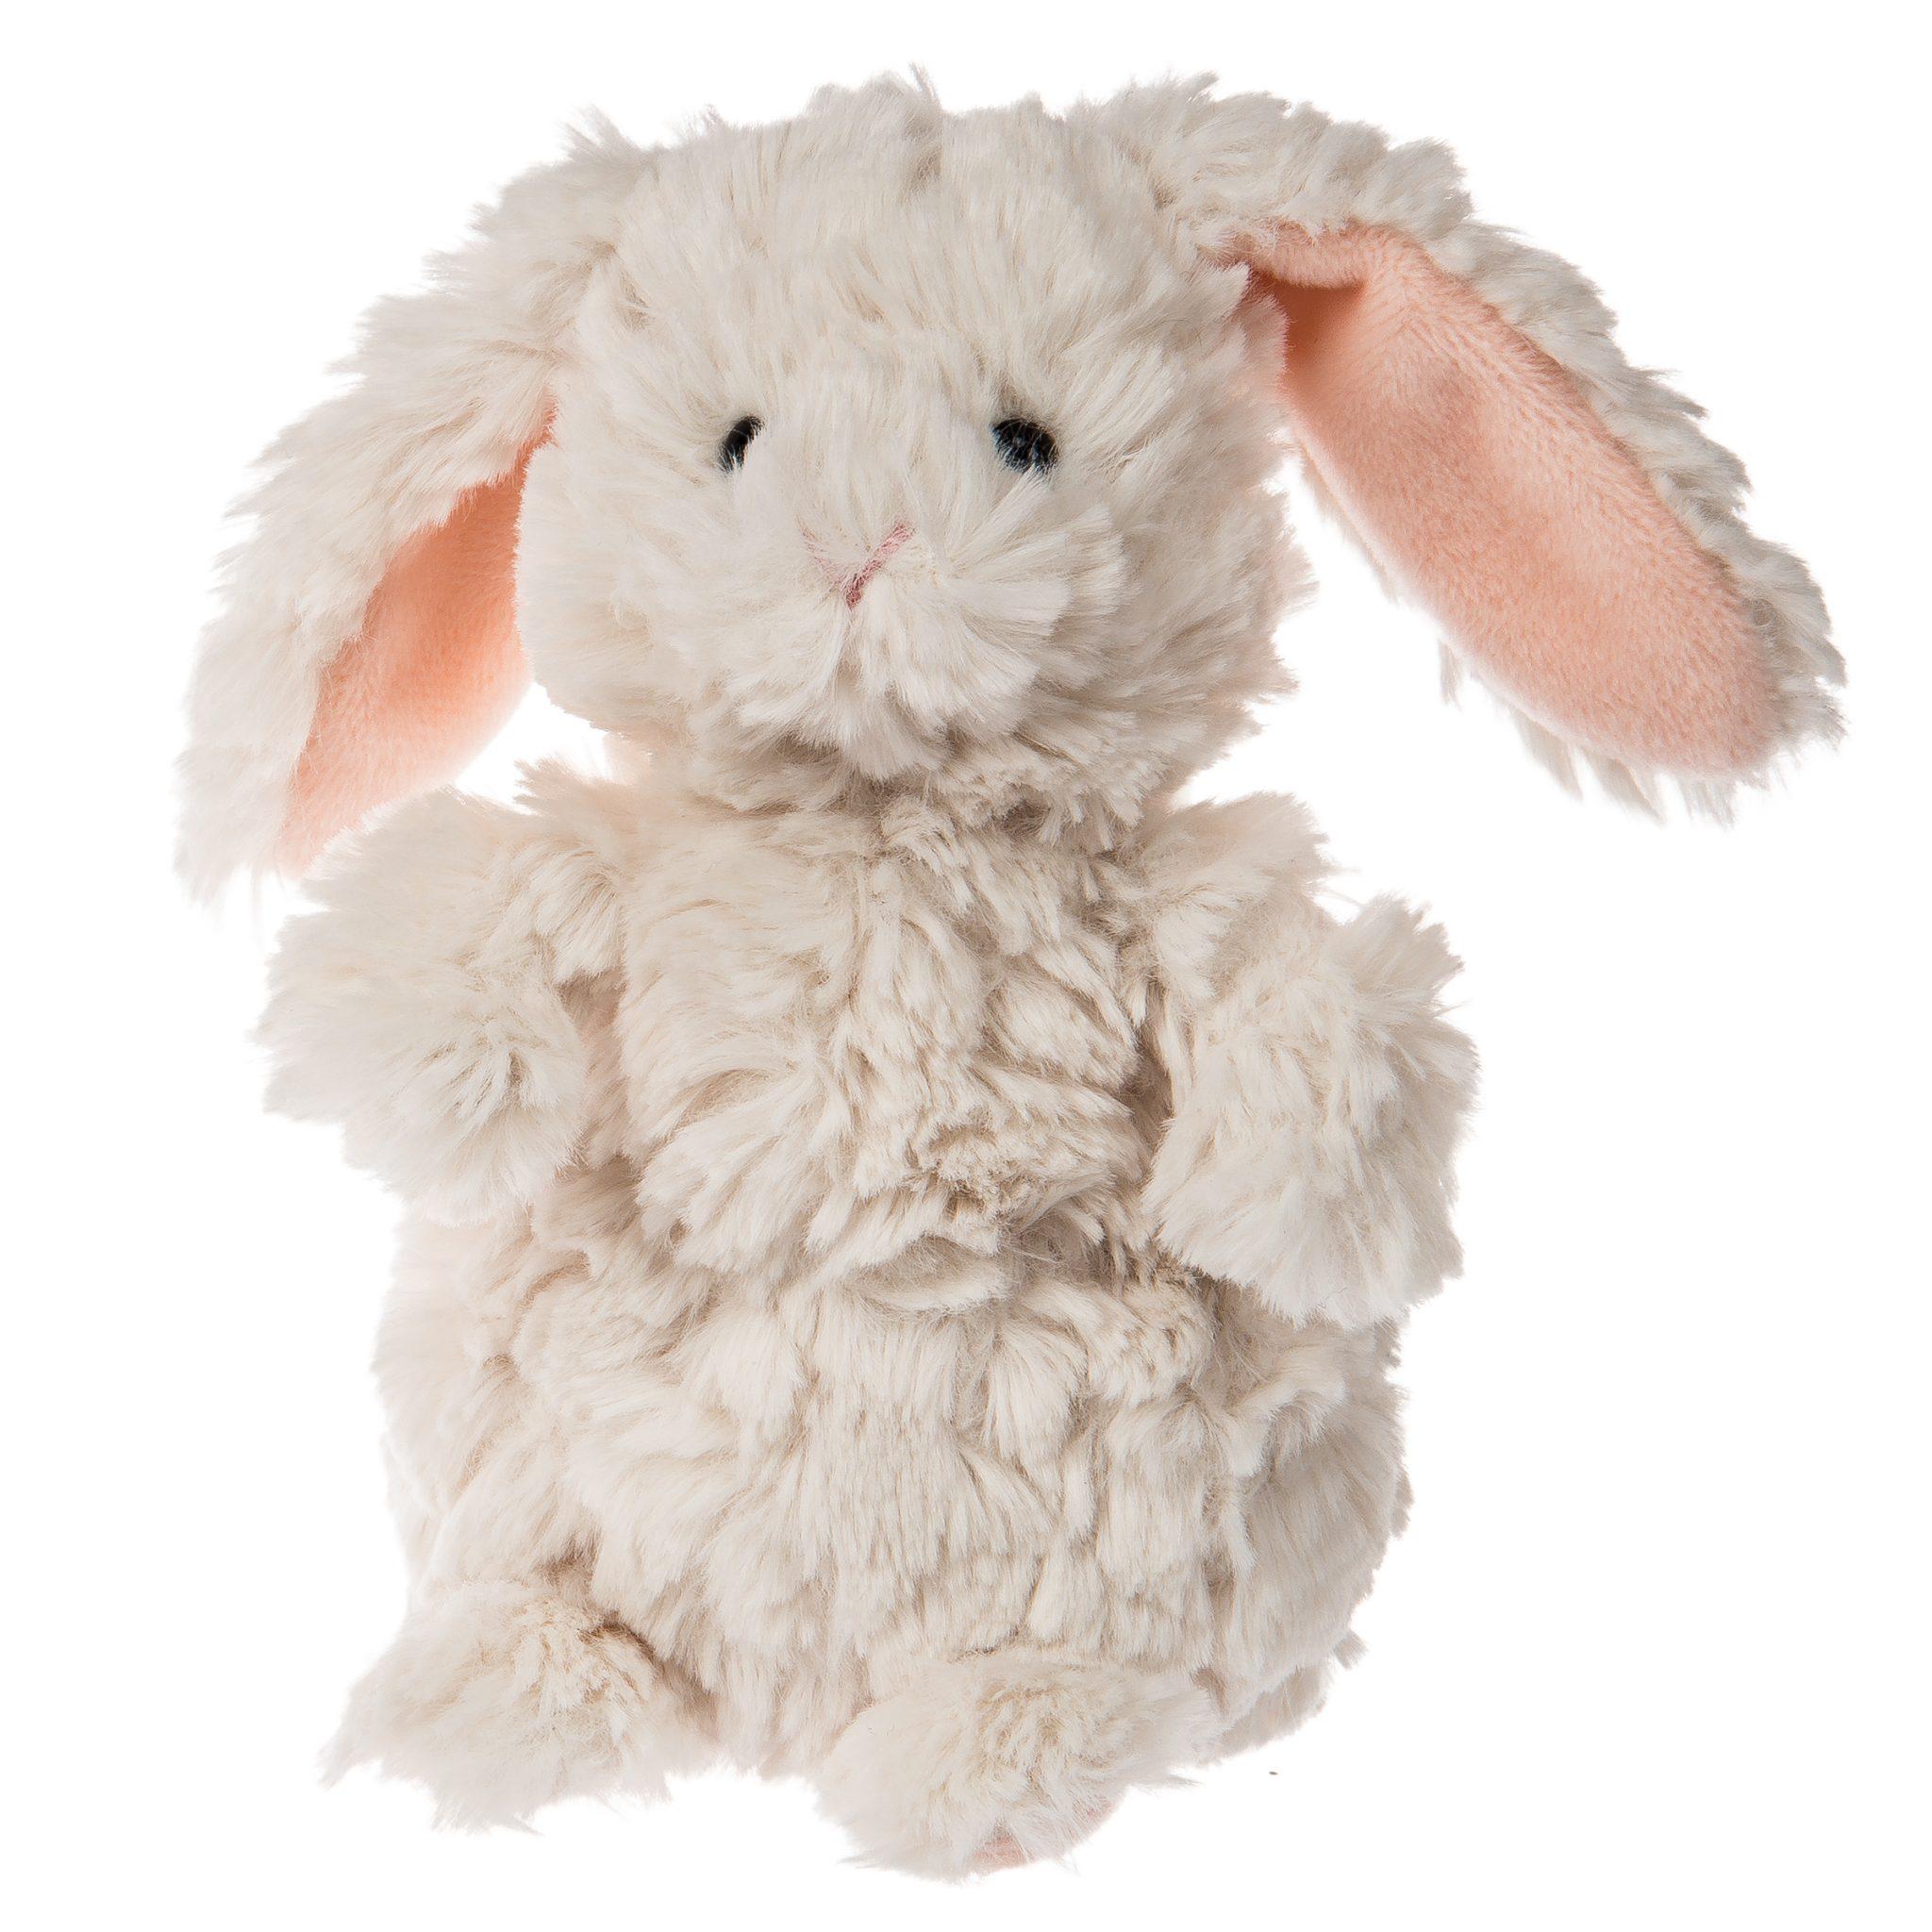 Mary Meyer Oatmeal Bunny Rattle 41700